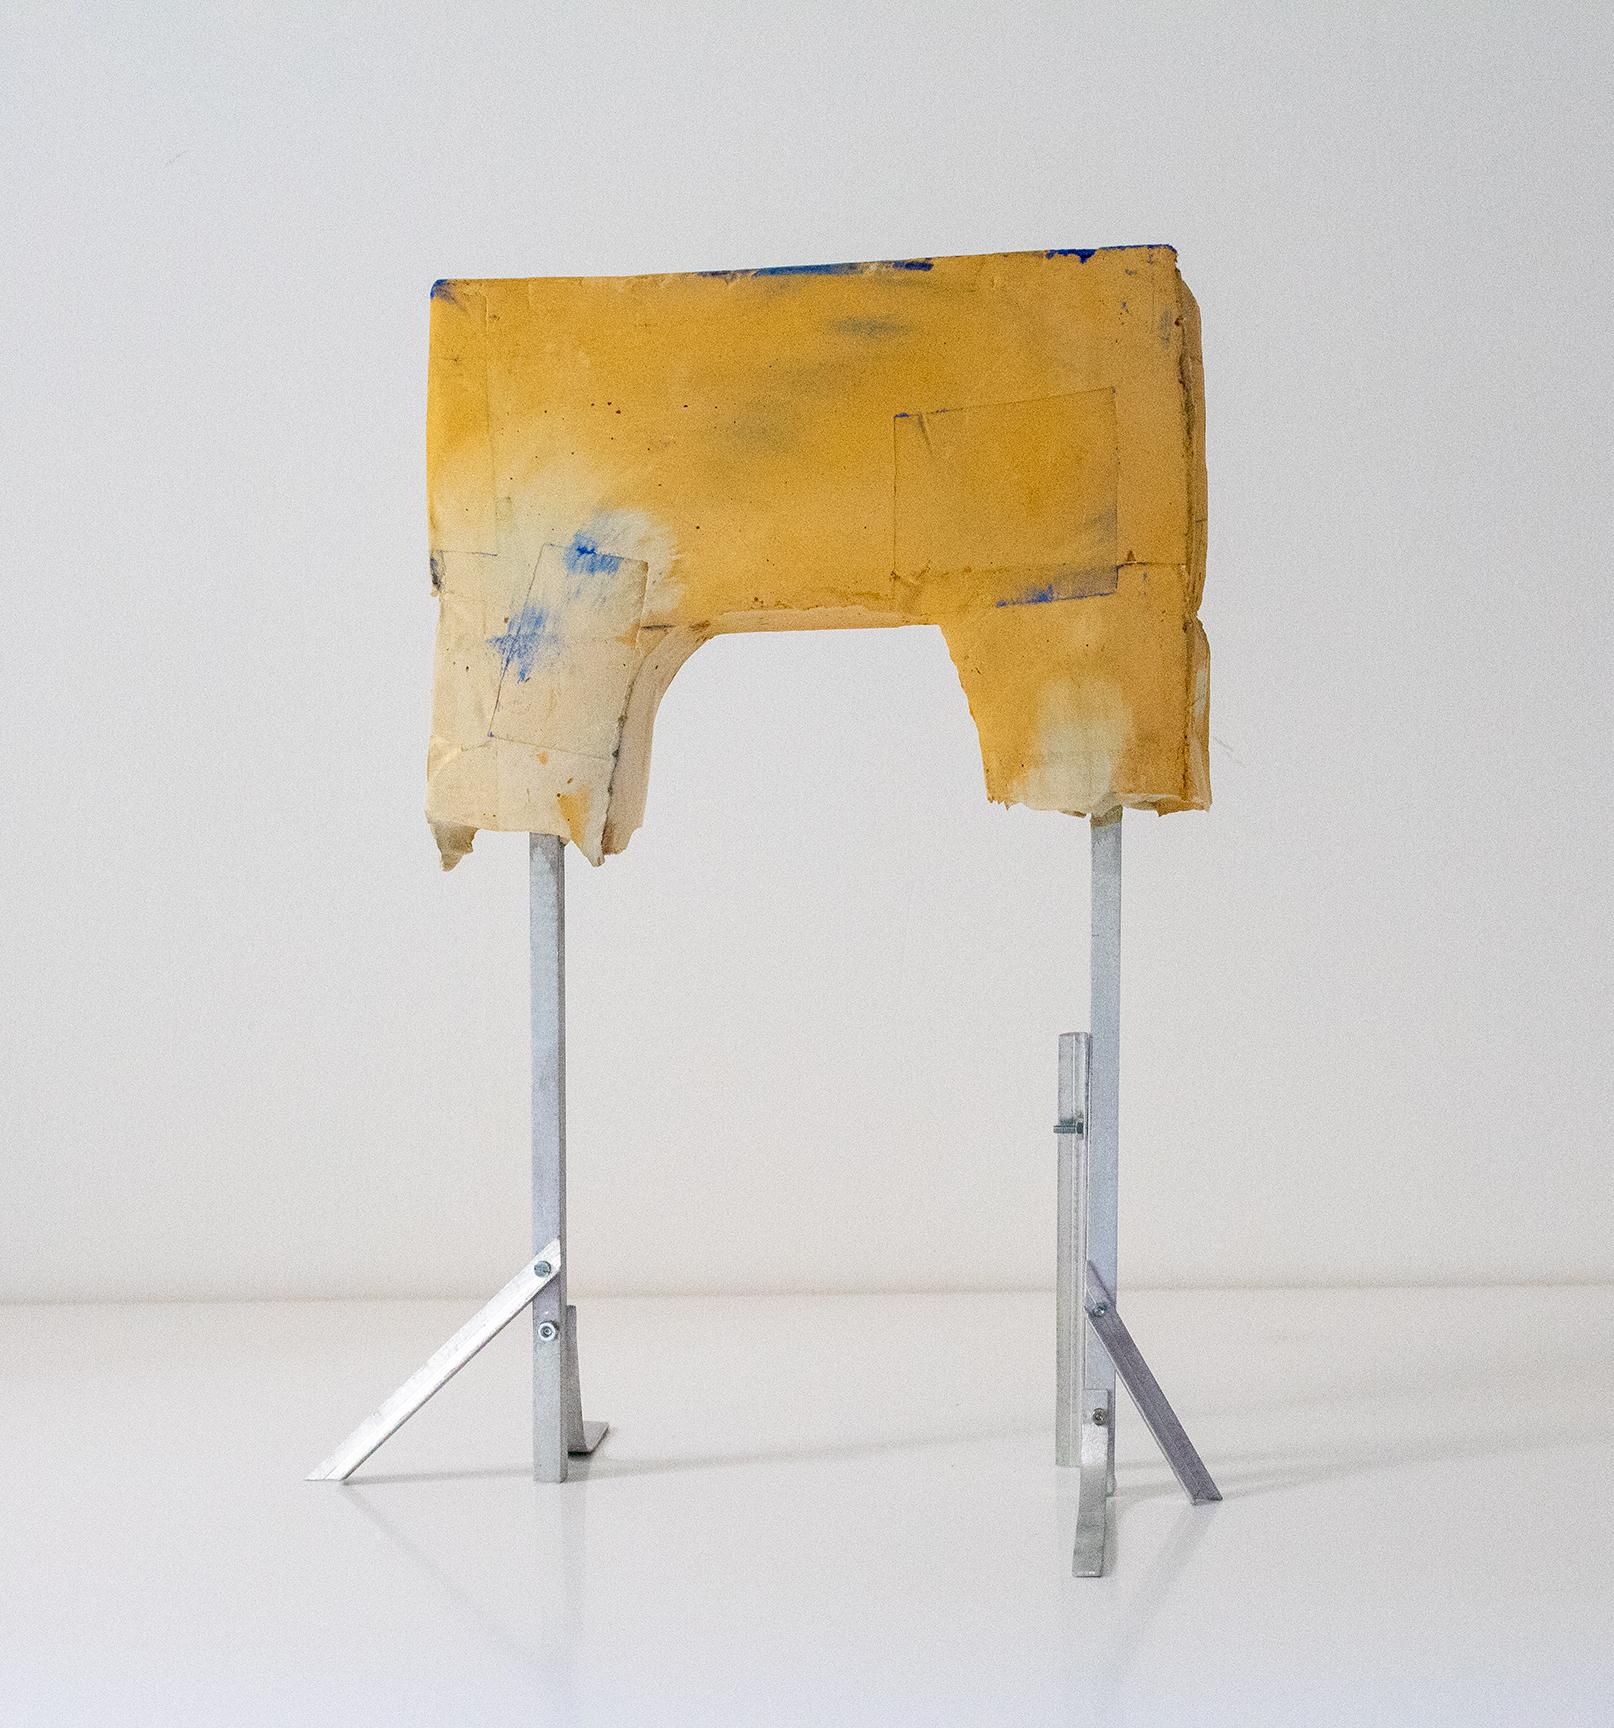 _Formschnitt Nr.2_Betonguss, Pigment, Aluminium_31 x 24 x 17 cm_2018